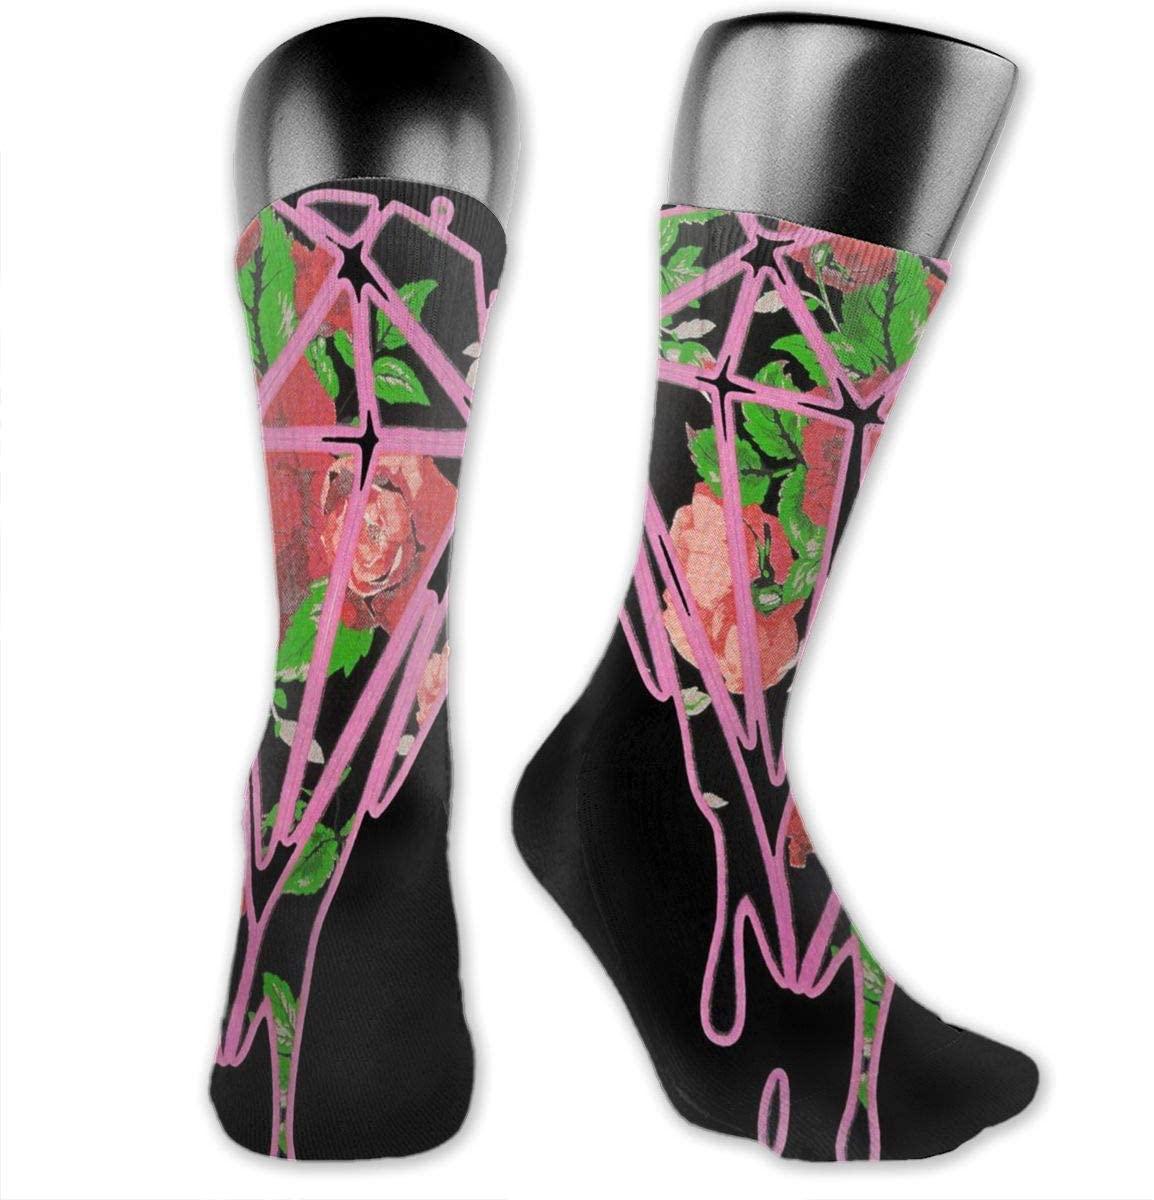 Roses Dripping Diamond Unisex Outdoor Long Socks Sport Athletic Crew Socks Stockings